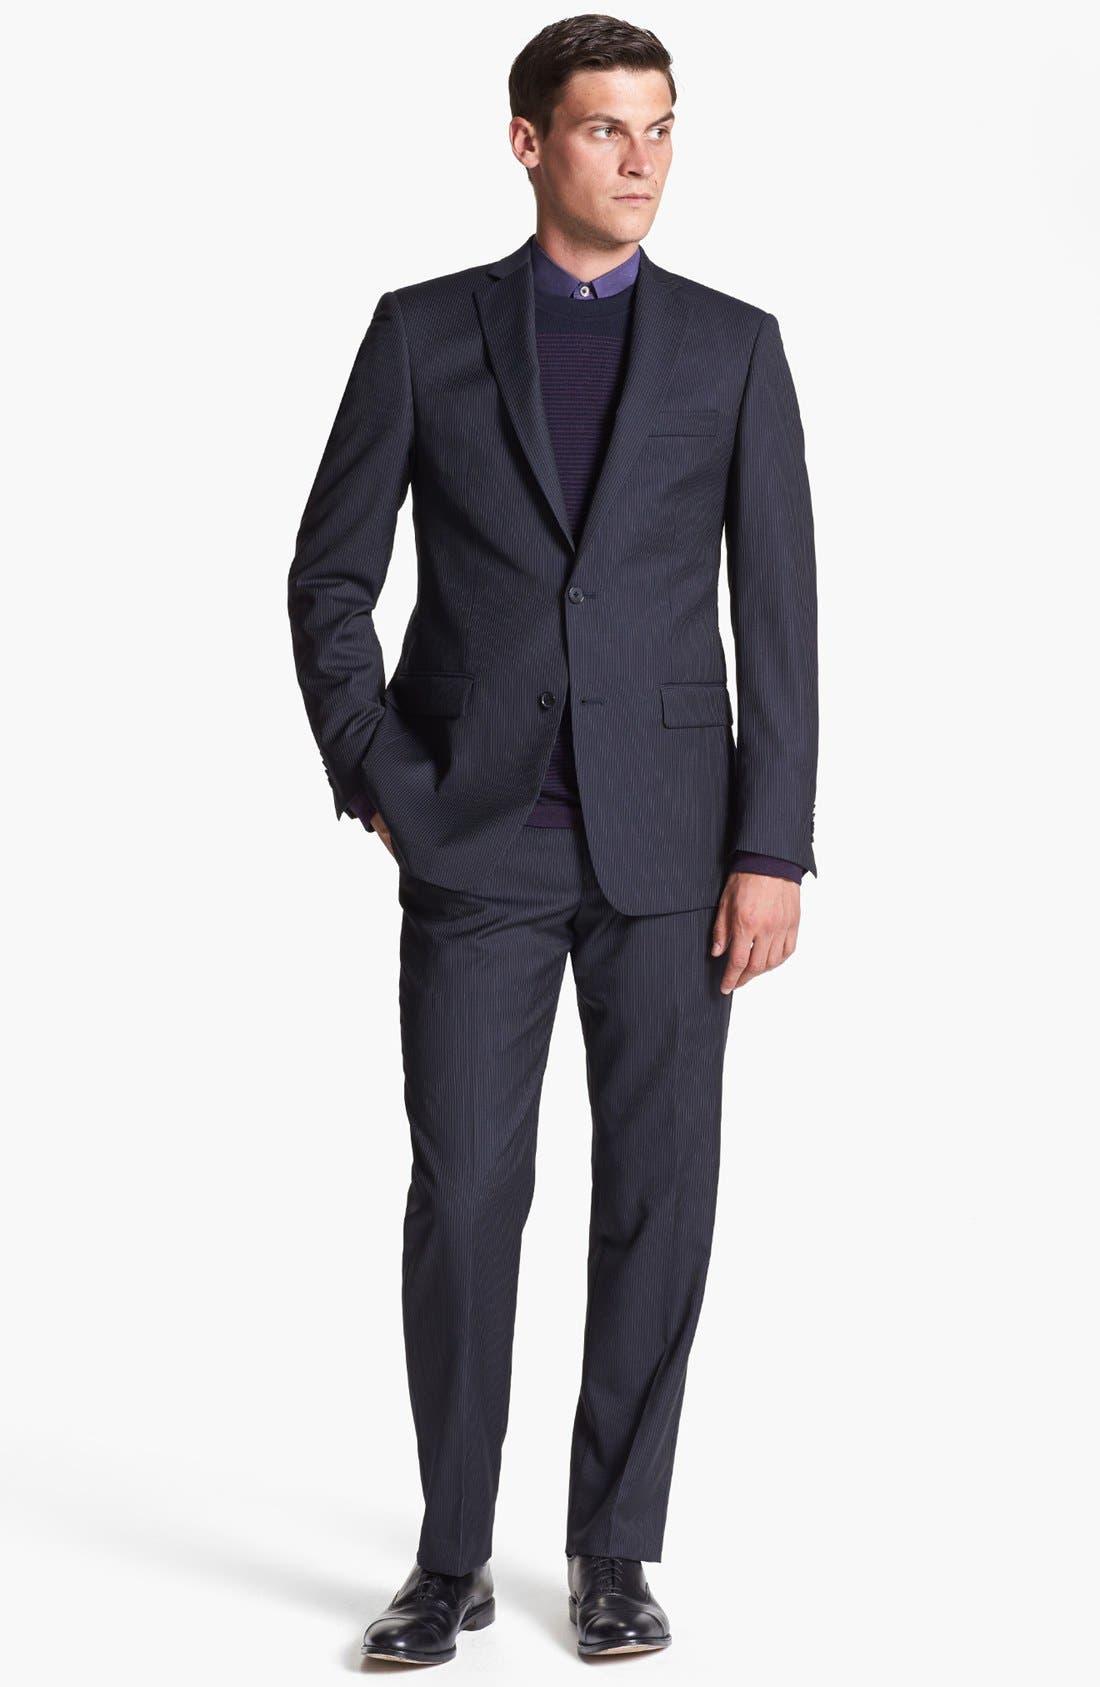 Main Image - Michael Kors Stripe Suit & Ted Baker London Sweater